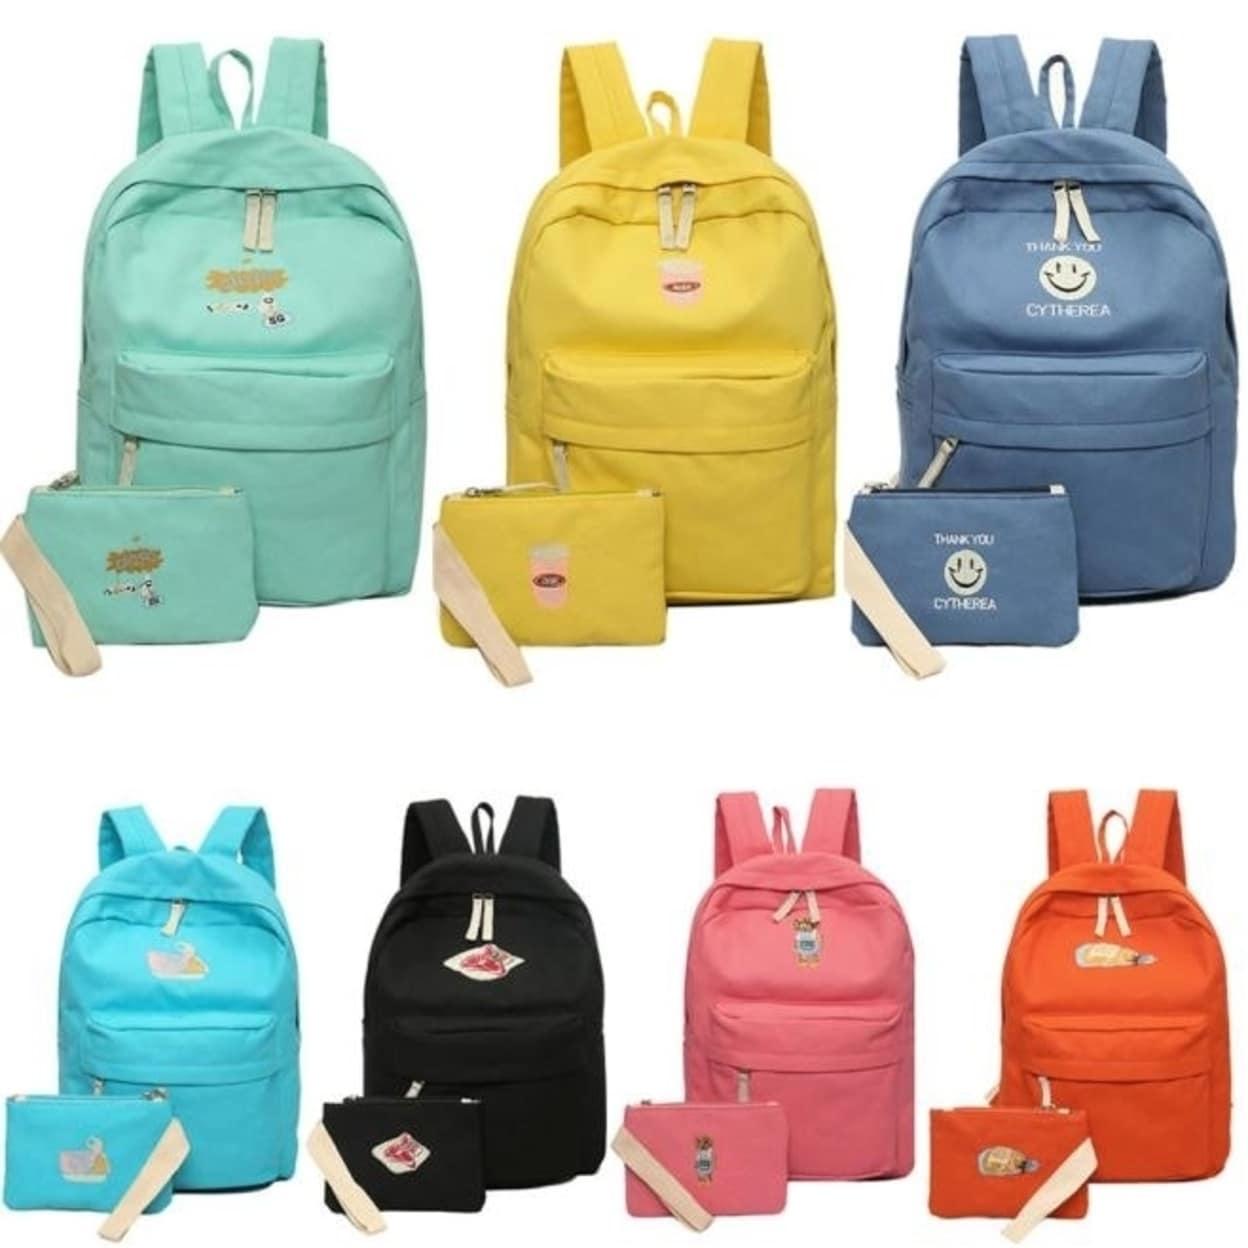 Women bags Rucksack Canvas Travel bags Backpack Girl School Fashion Shoulder Bag